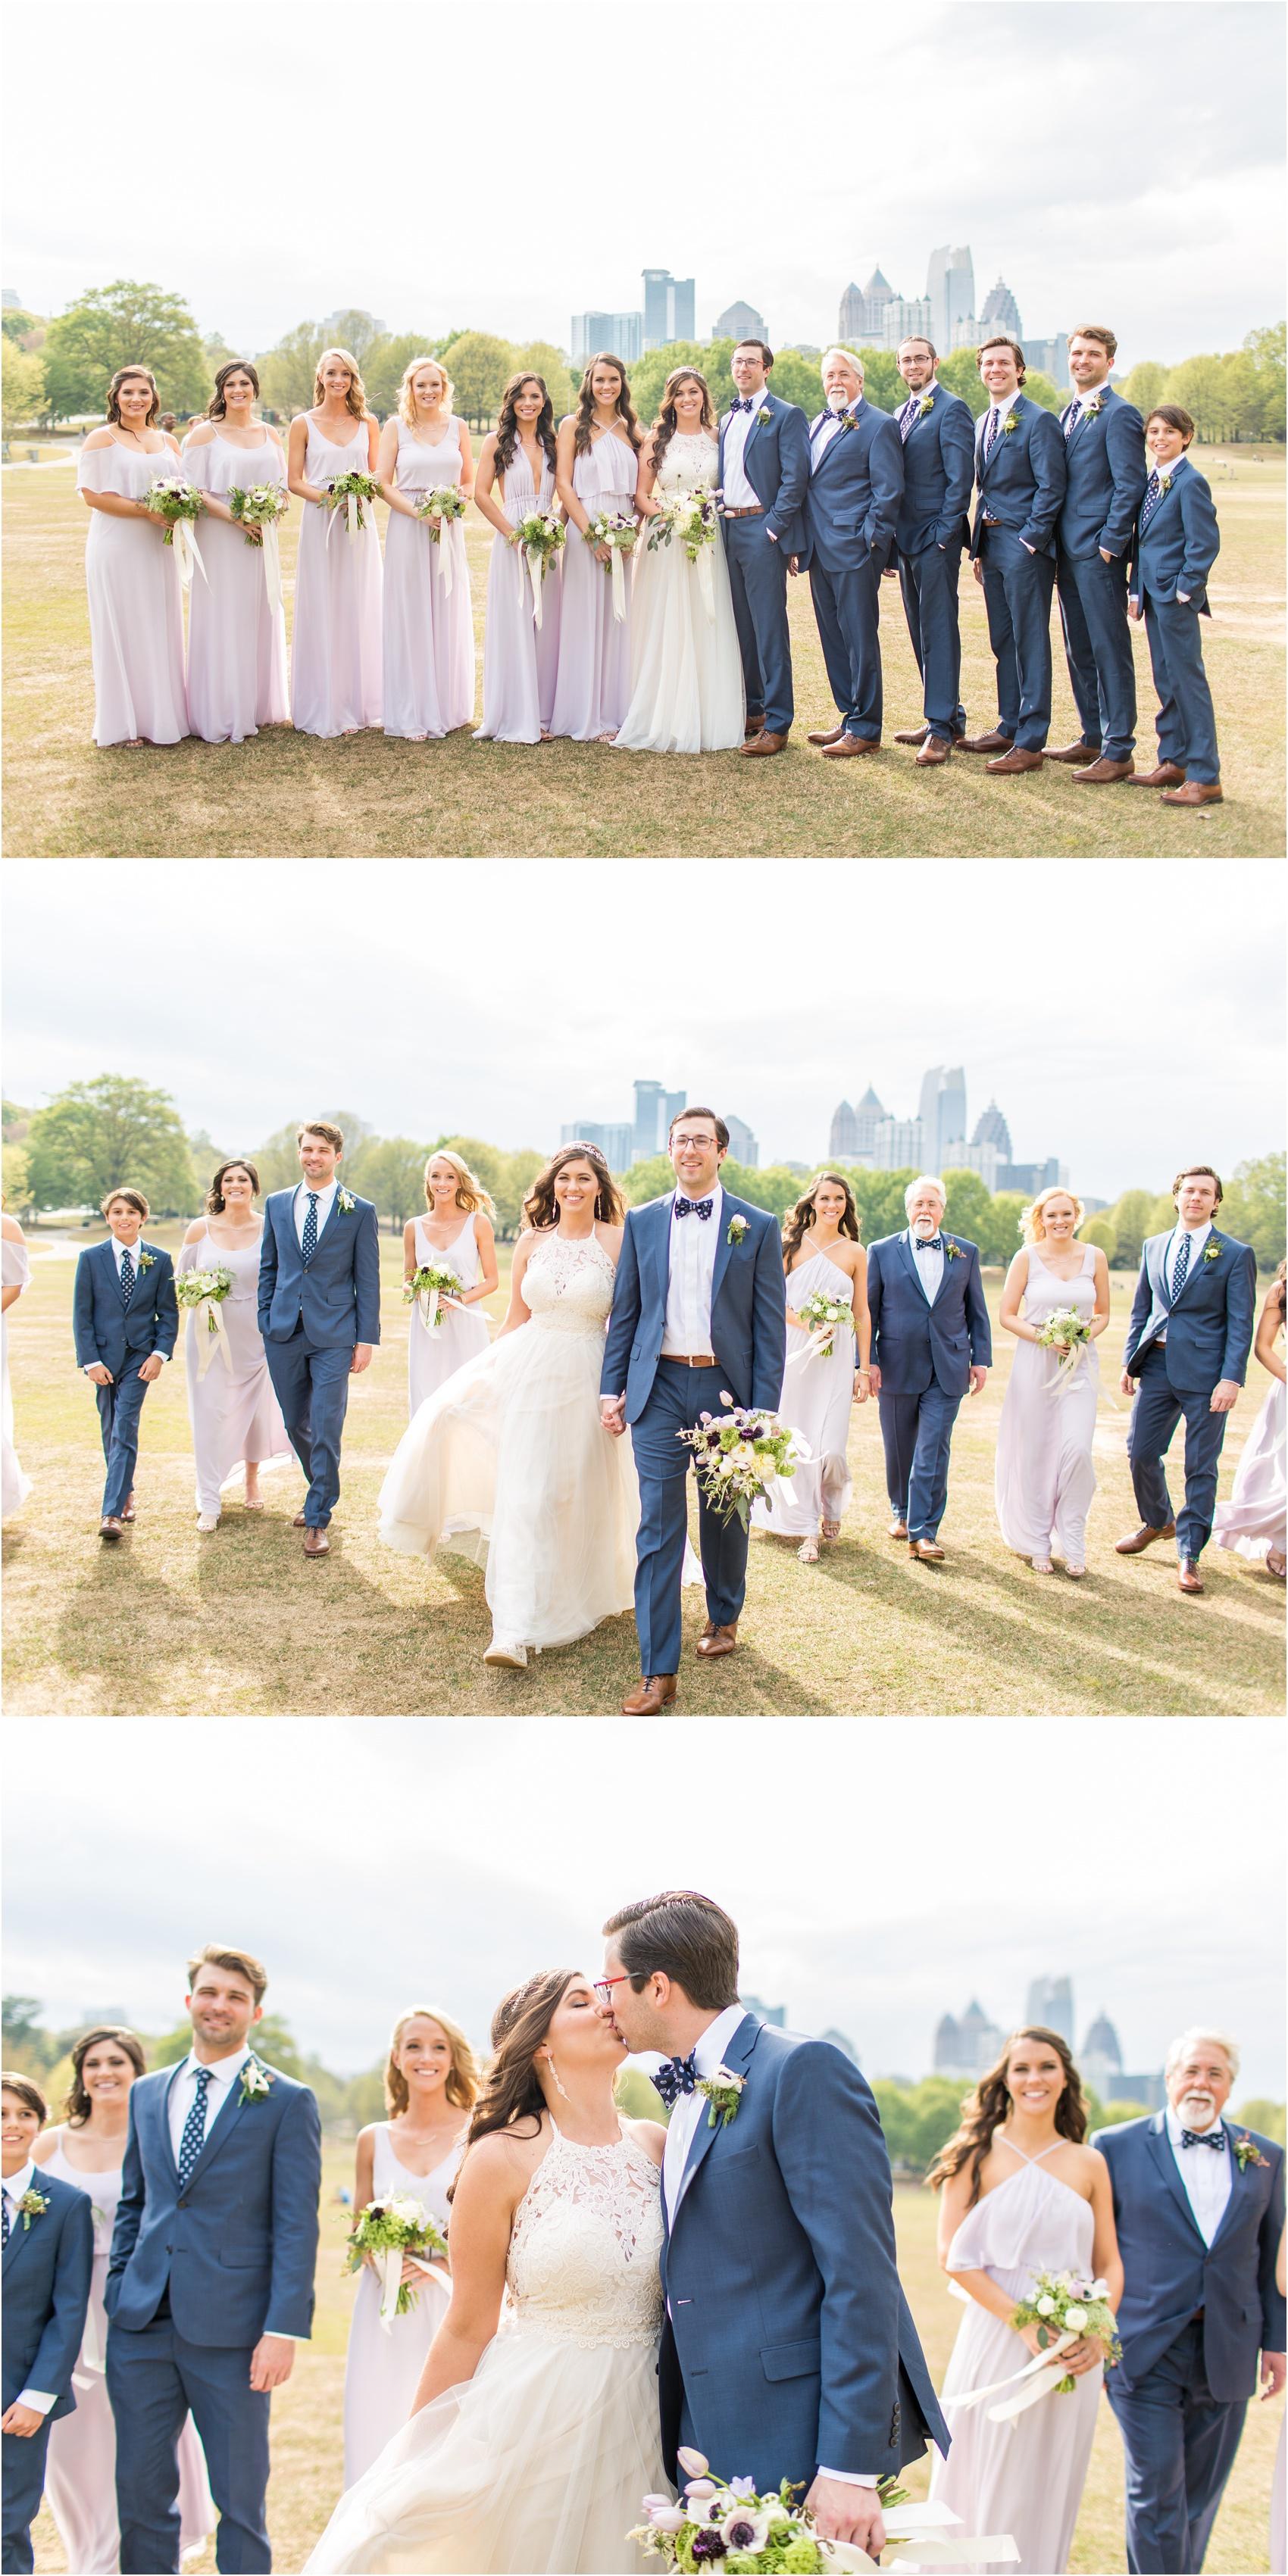 Savannah Eve Photography- Groseclose Wedding- Blog-30.jpg